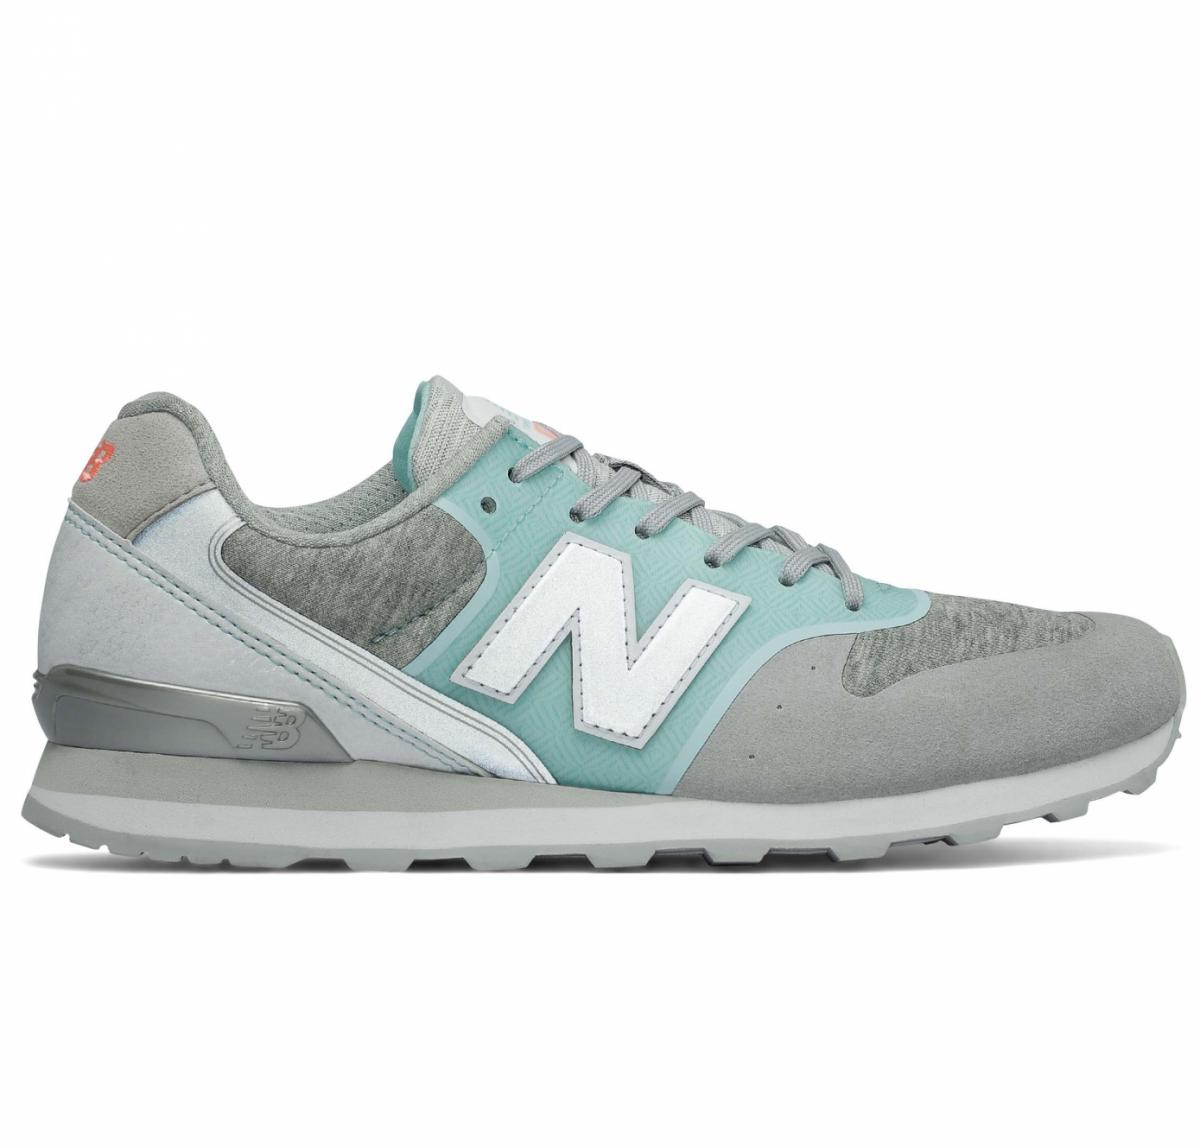 New Balance WR996 Sneaker Damen Schuhe grau blau